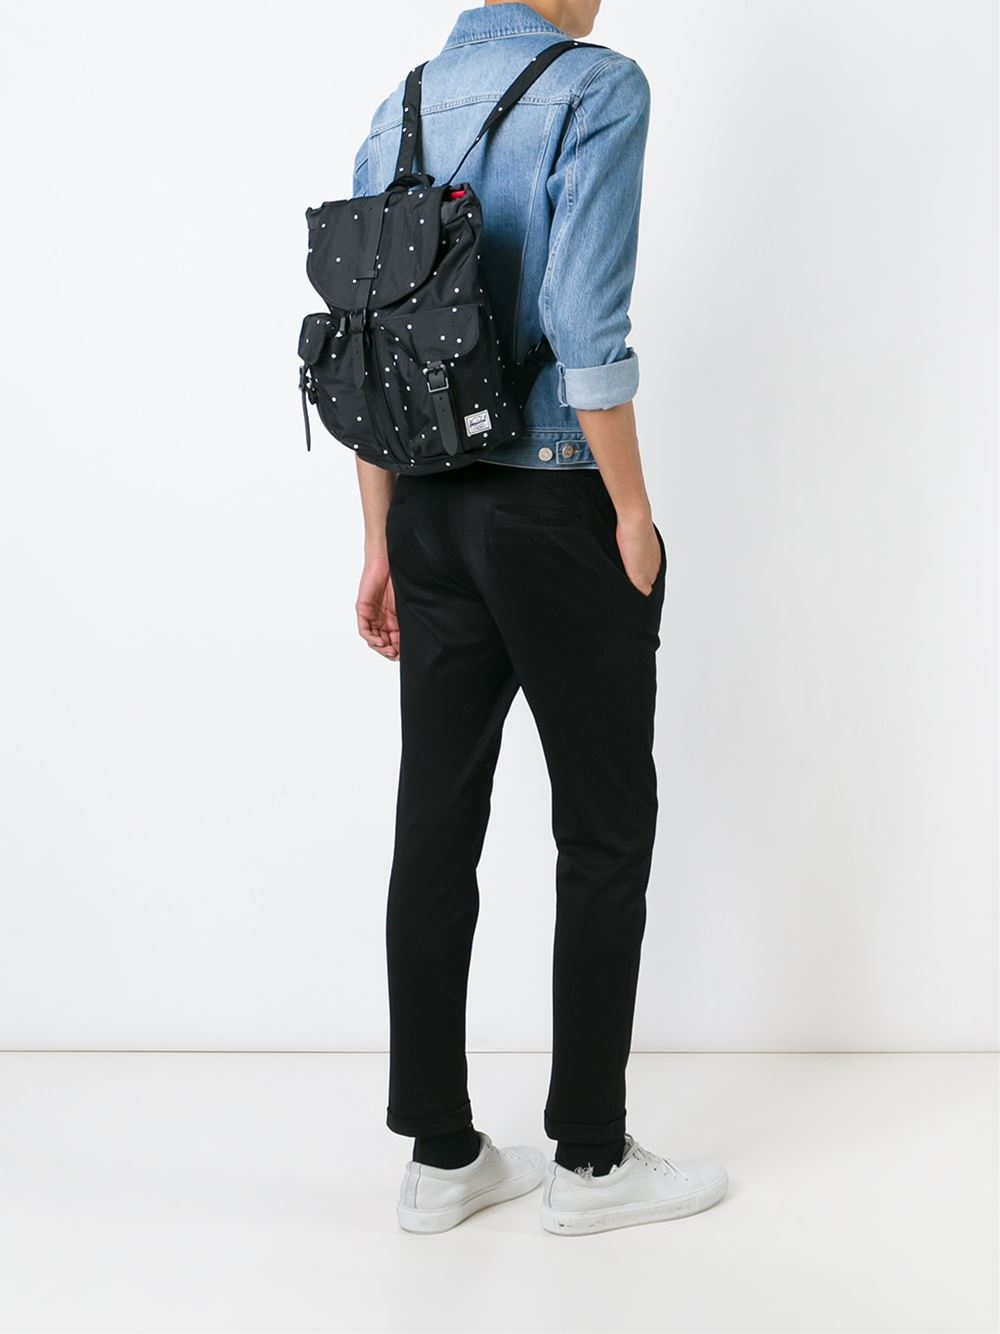 a1de94787394 Lyst - Herschel Supply Co.  dawson  Backpack in Black